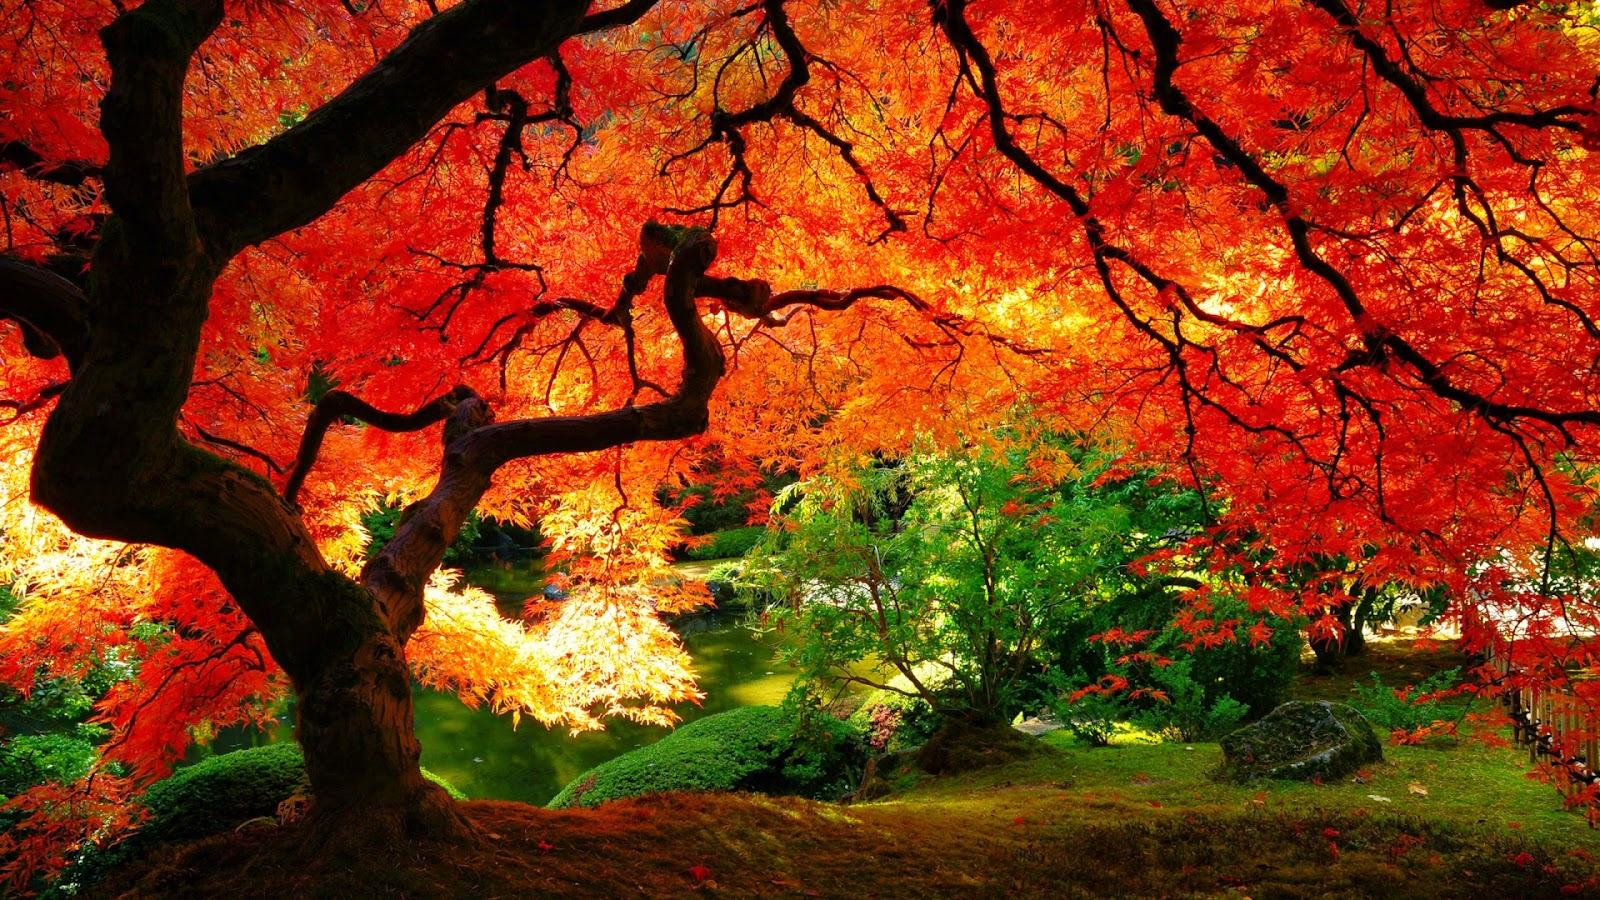 Autumn Desktop Wallpaper 2014  Picture Gallery